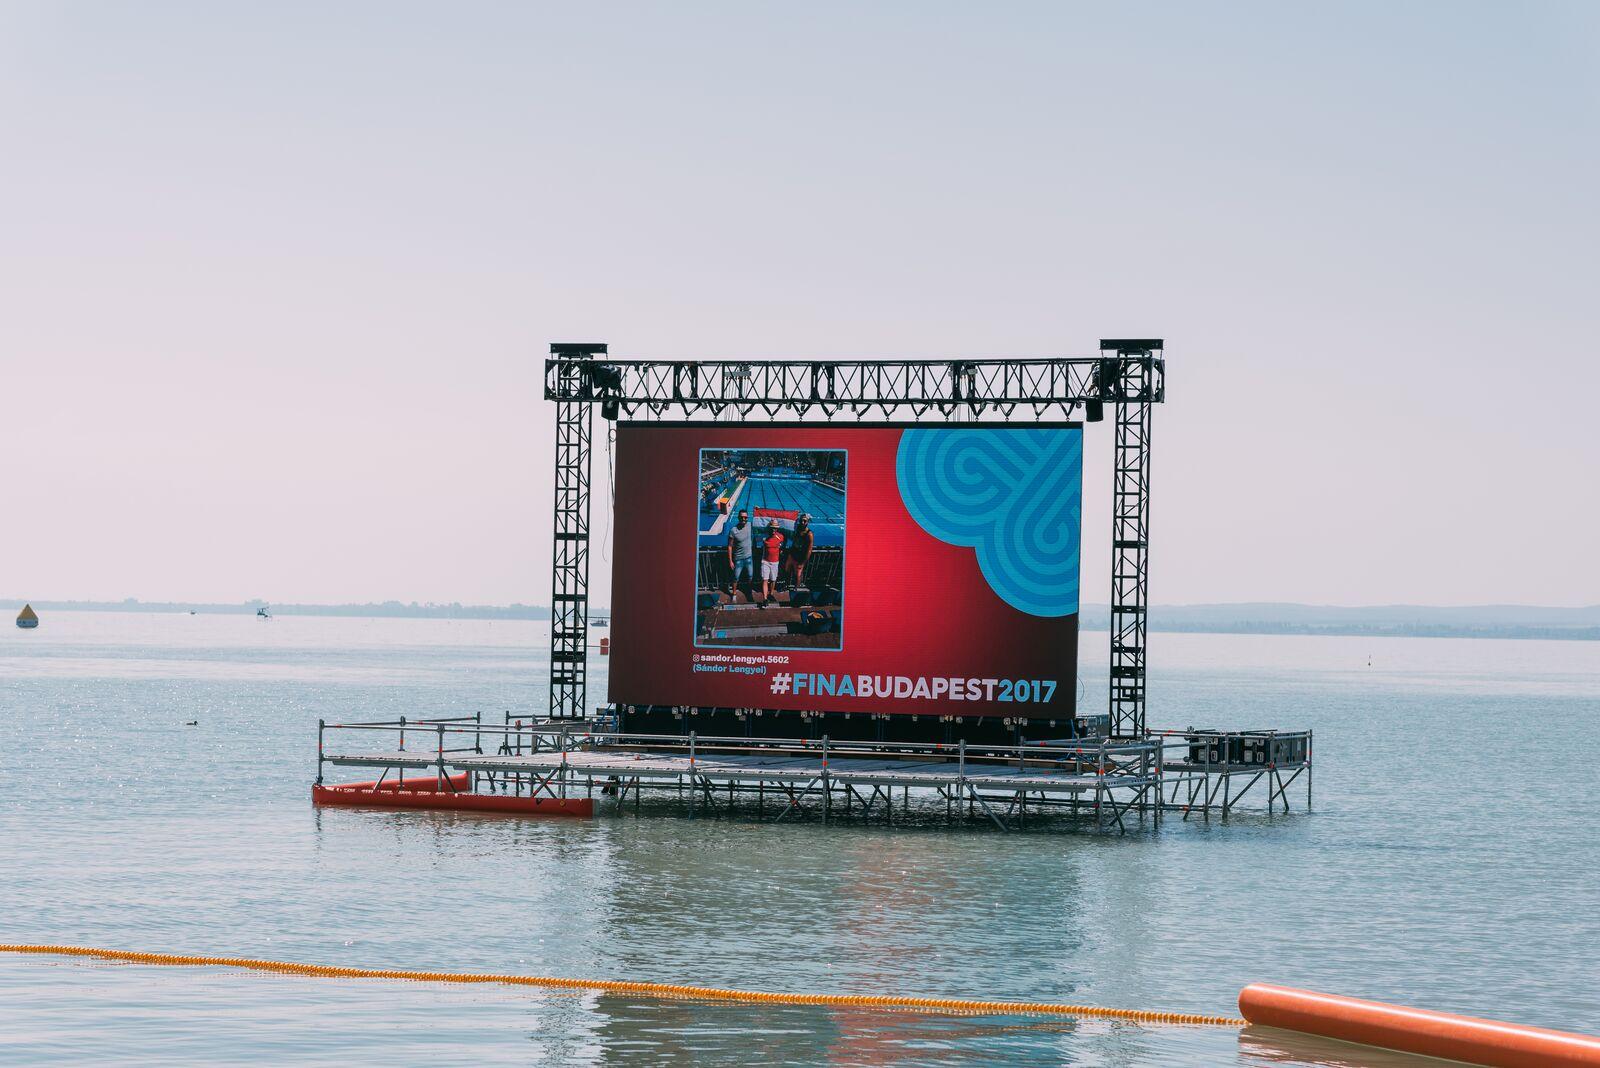 Hungary Budapest 2017